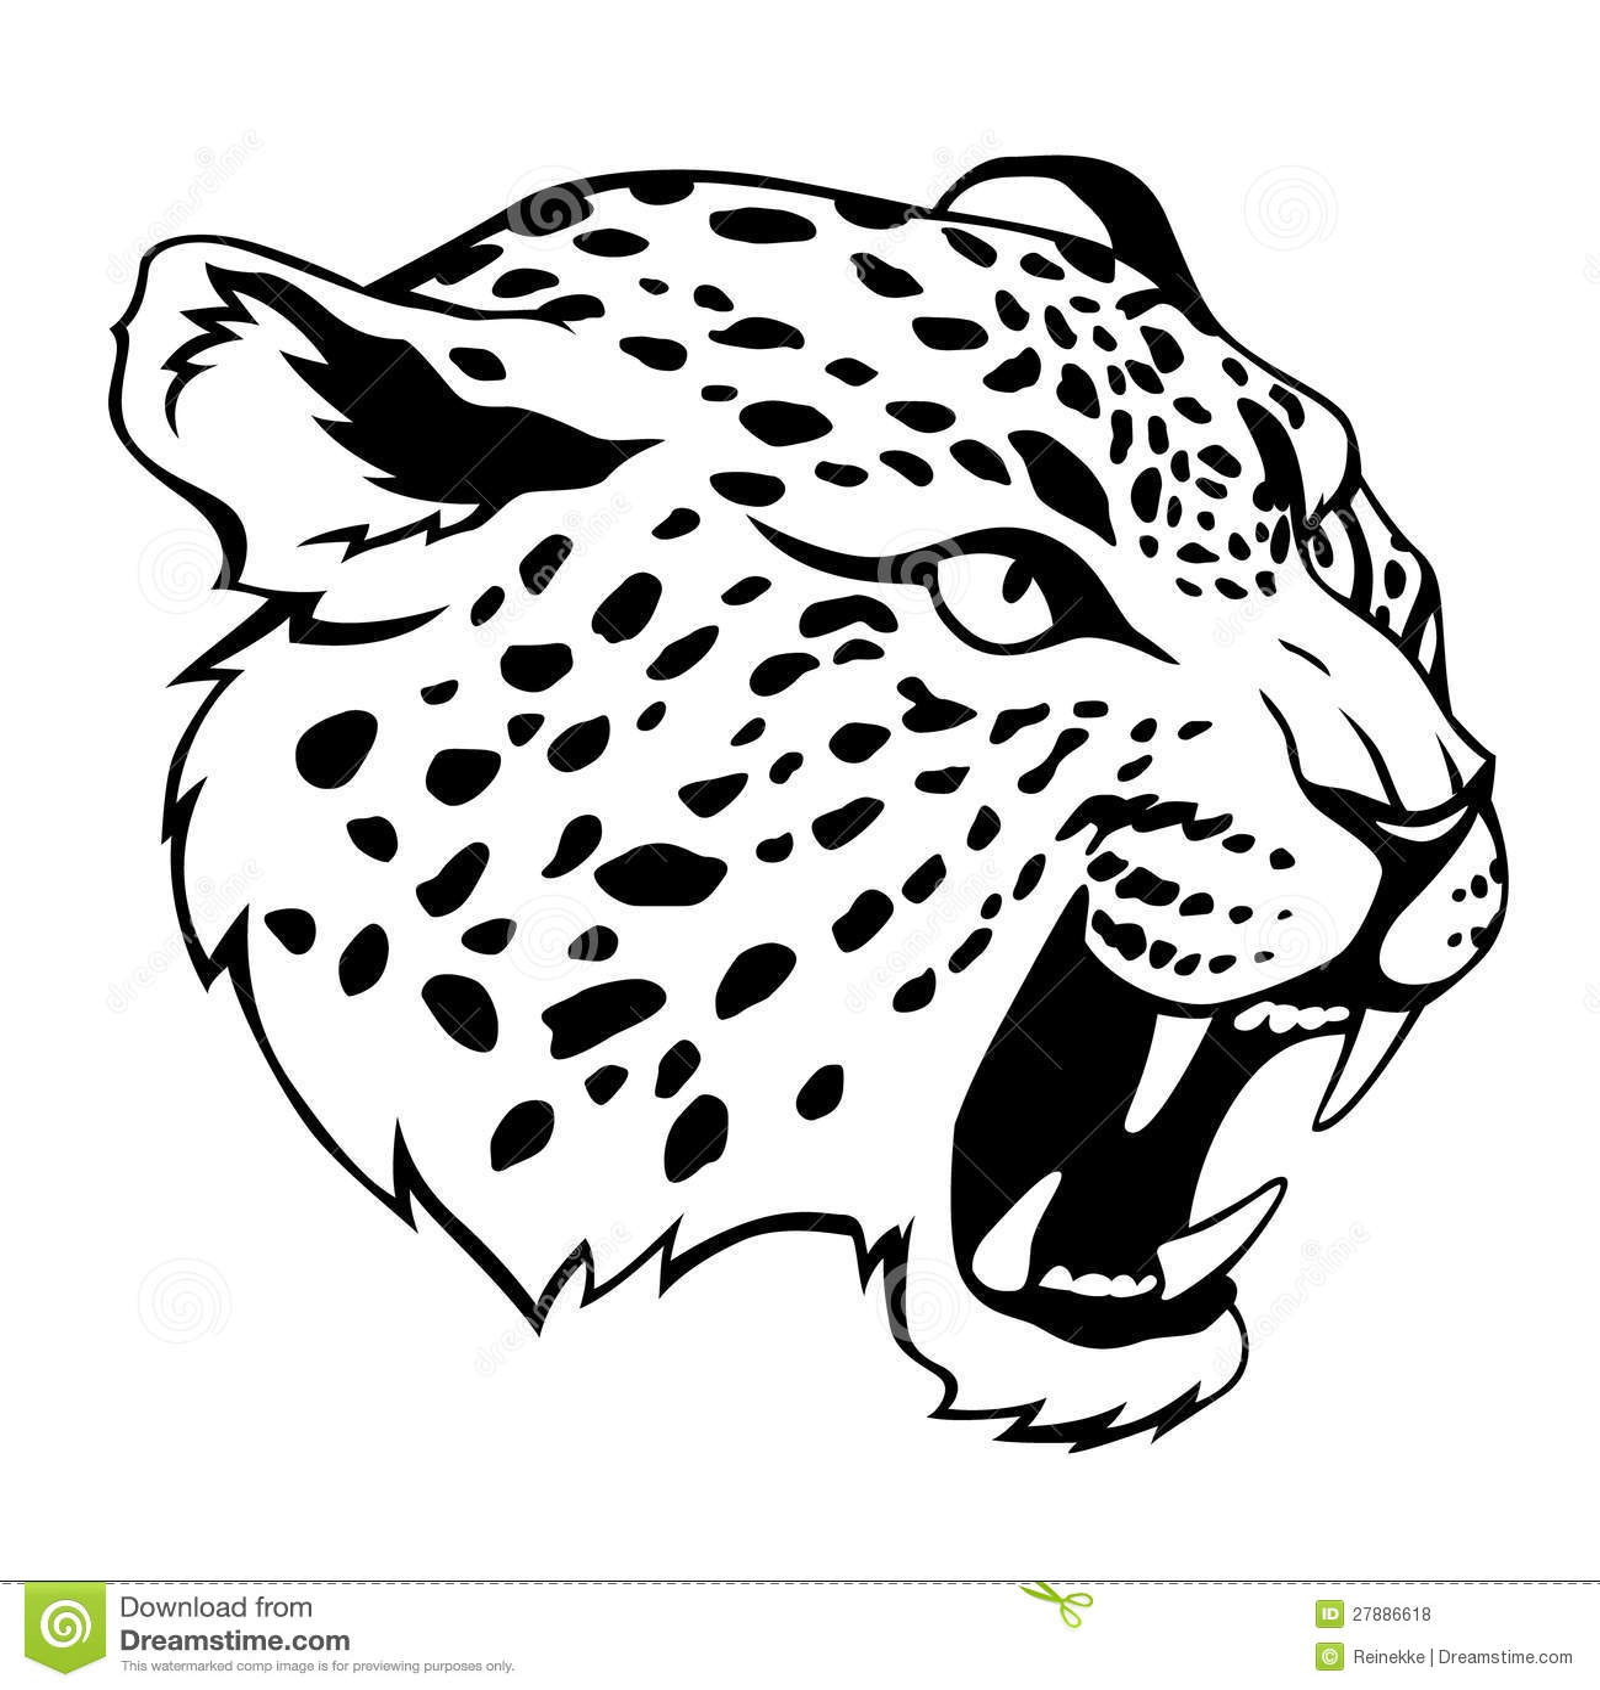 jaguar face illustration - photo #11